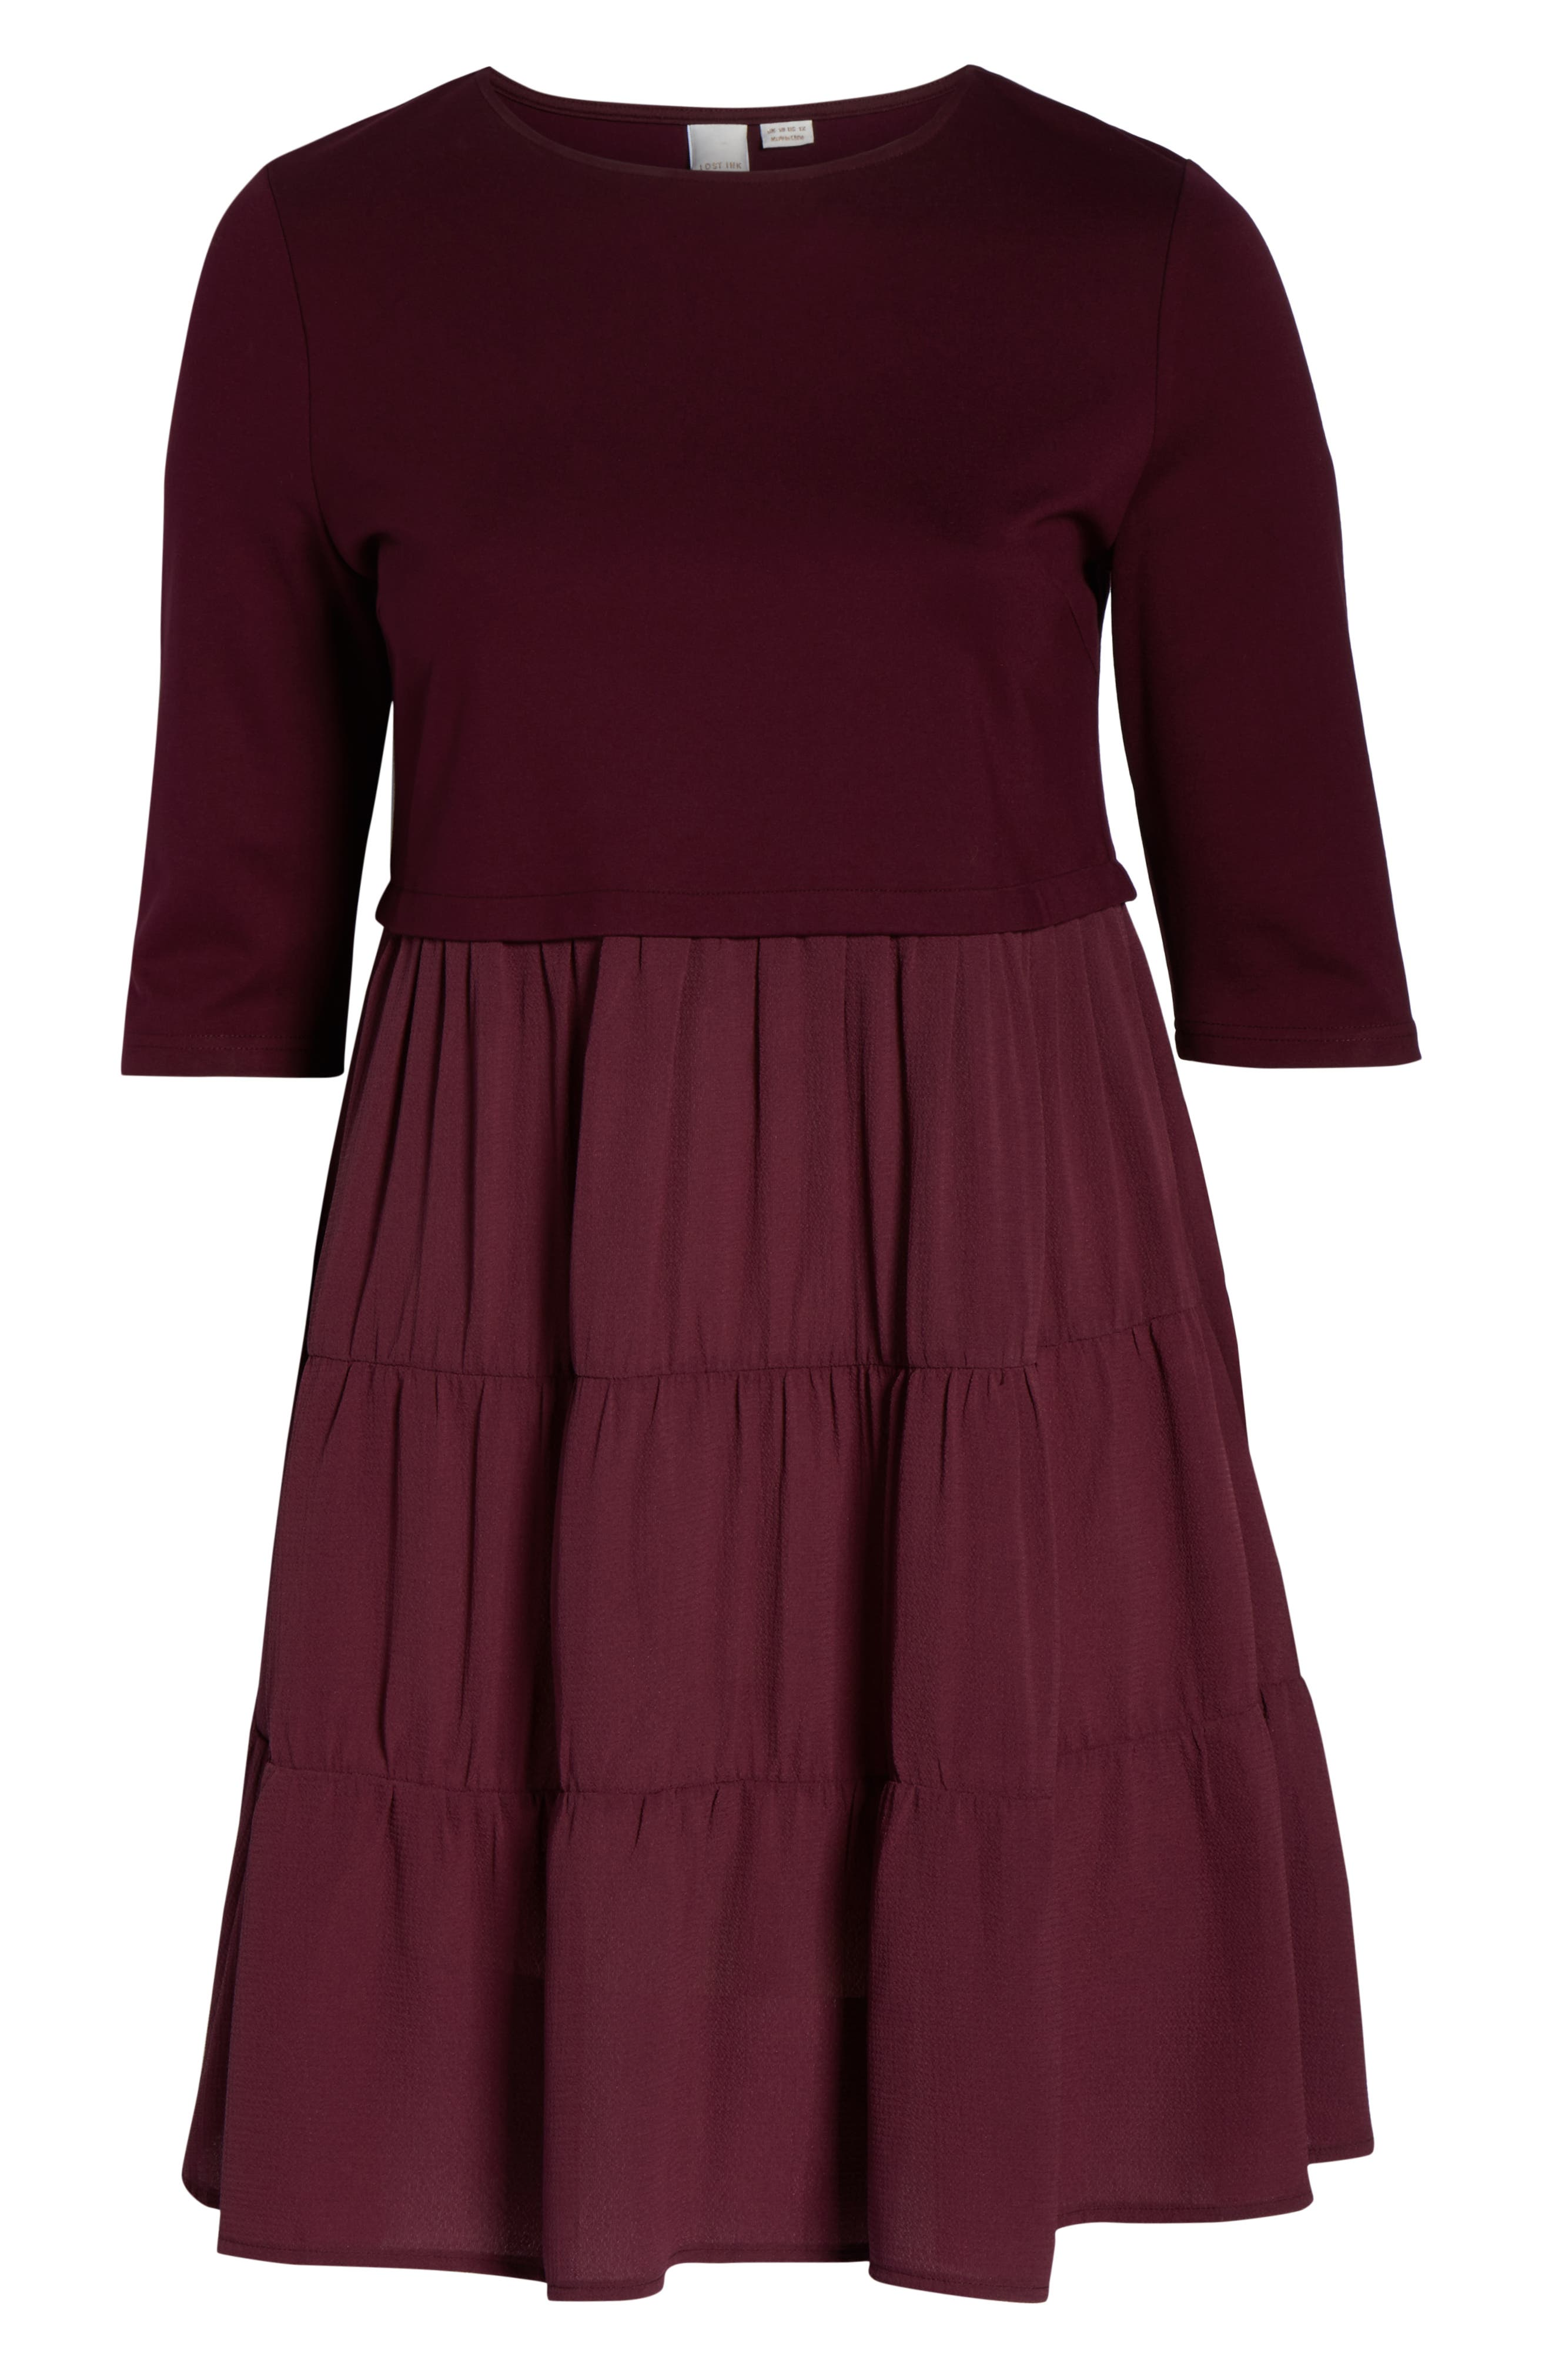 Mixed Media Ruffle Detail Swing Dress,                             Alternate thumbnail 7, color,                             BURGUNDY